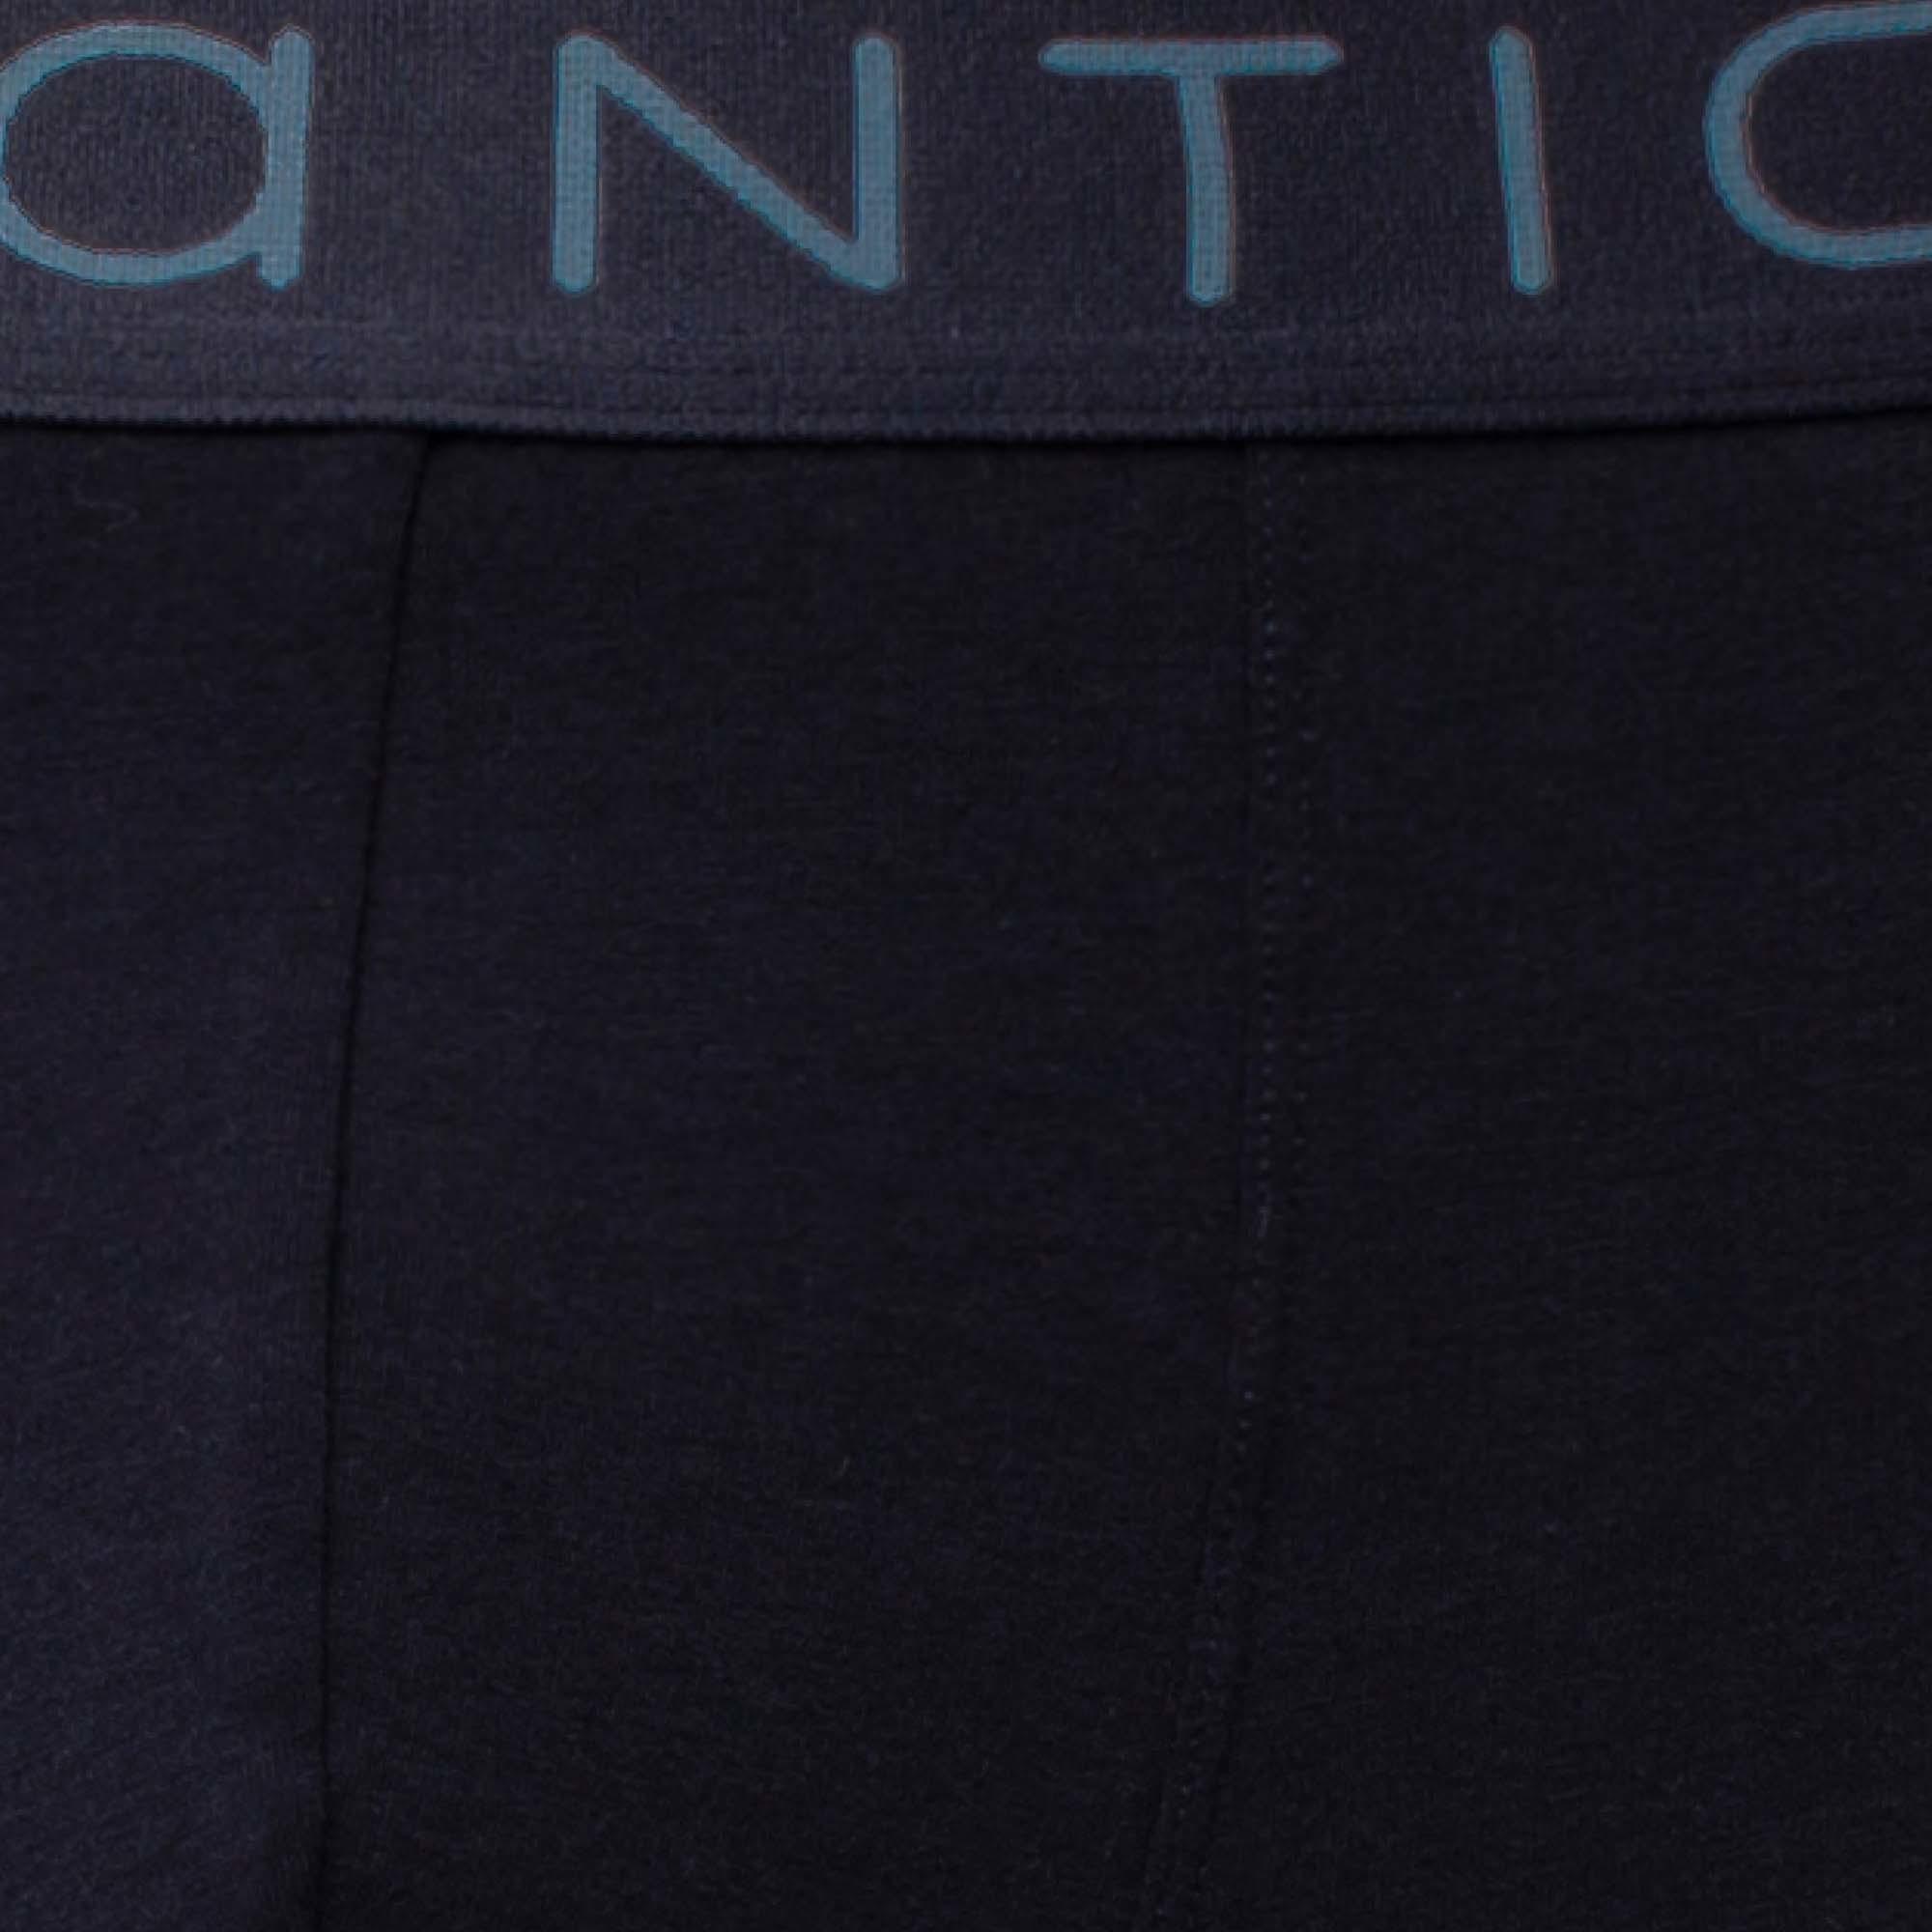 Трусы мужские шорты MH-1110